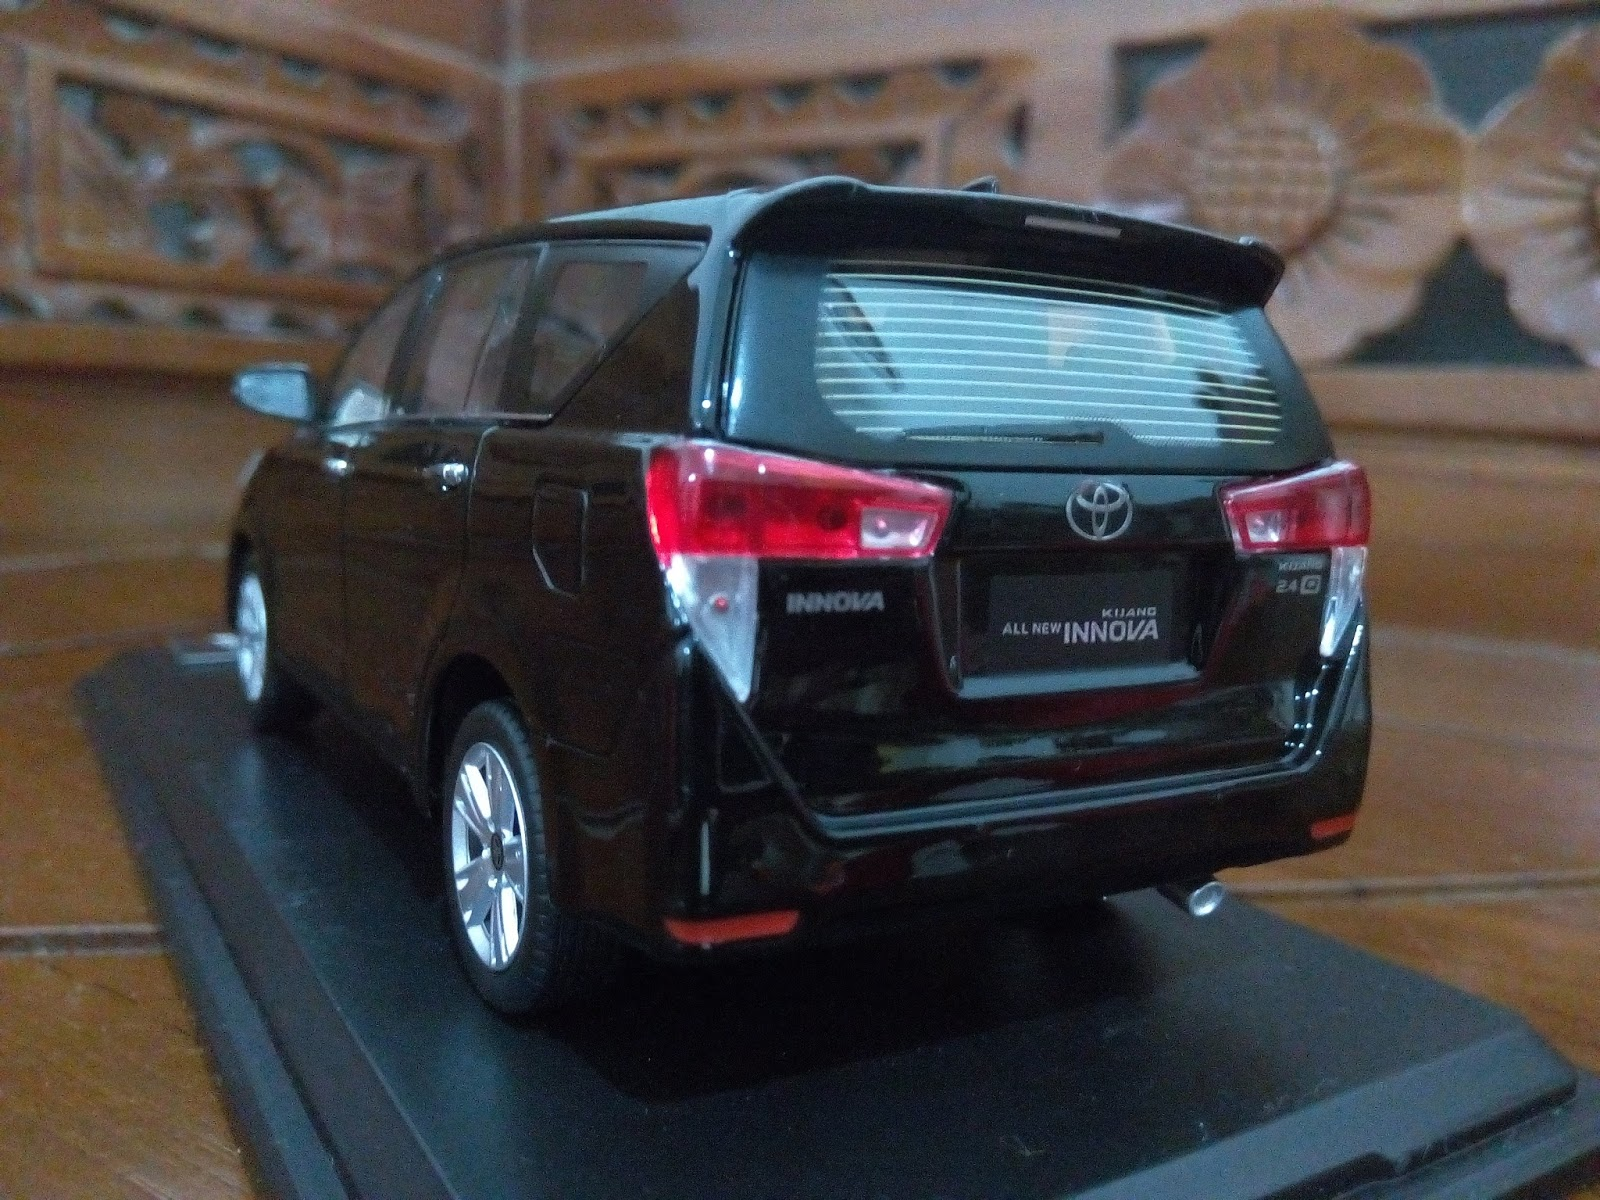 New Kijang Innova Spesifikasi Toyota Yaris Trd Sportivo Bekas 2016 Miniatur Diecast Mobil